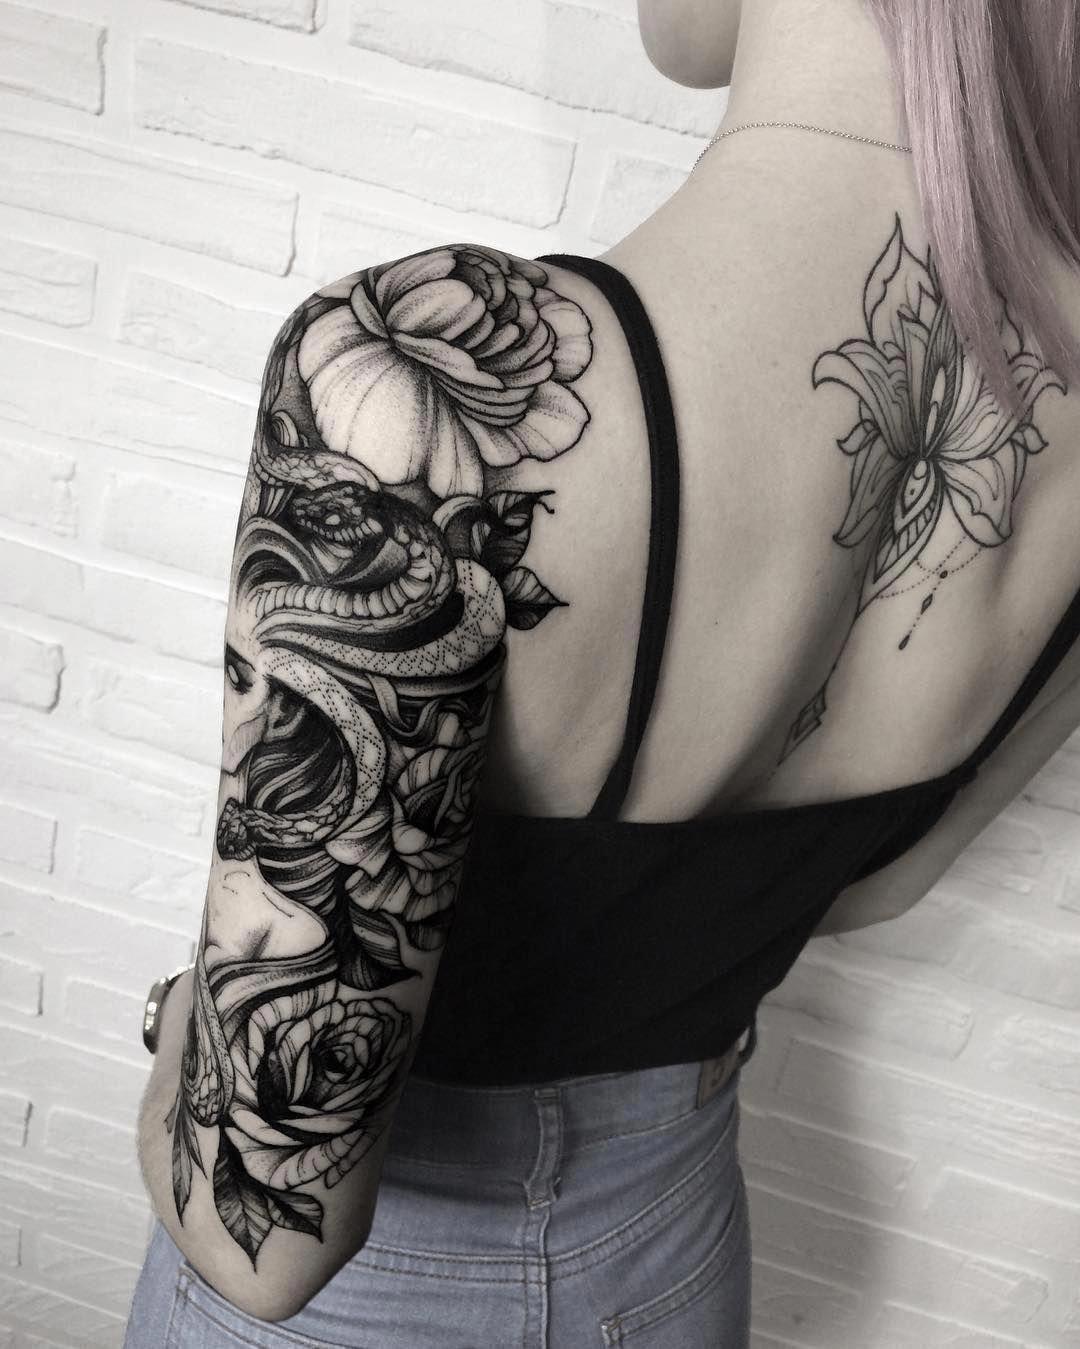 Upper Half Sleeve Tattoos Halfsleevetattoos Upper Half Sleeve Tattoos Halfsleevetattoos Get More P Half Sleeve Tattoo Sleeve Tattoos For Women Sleeve Tattoos